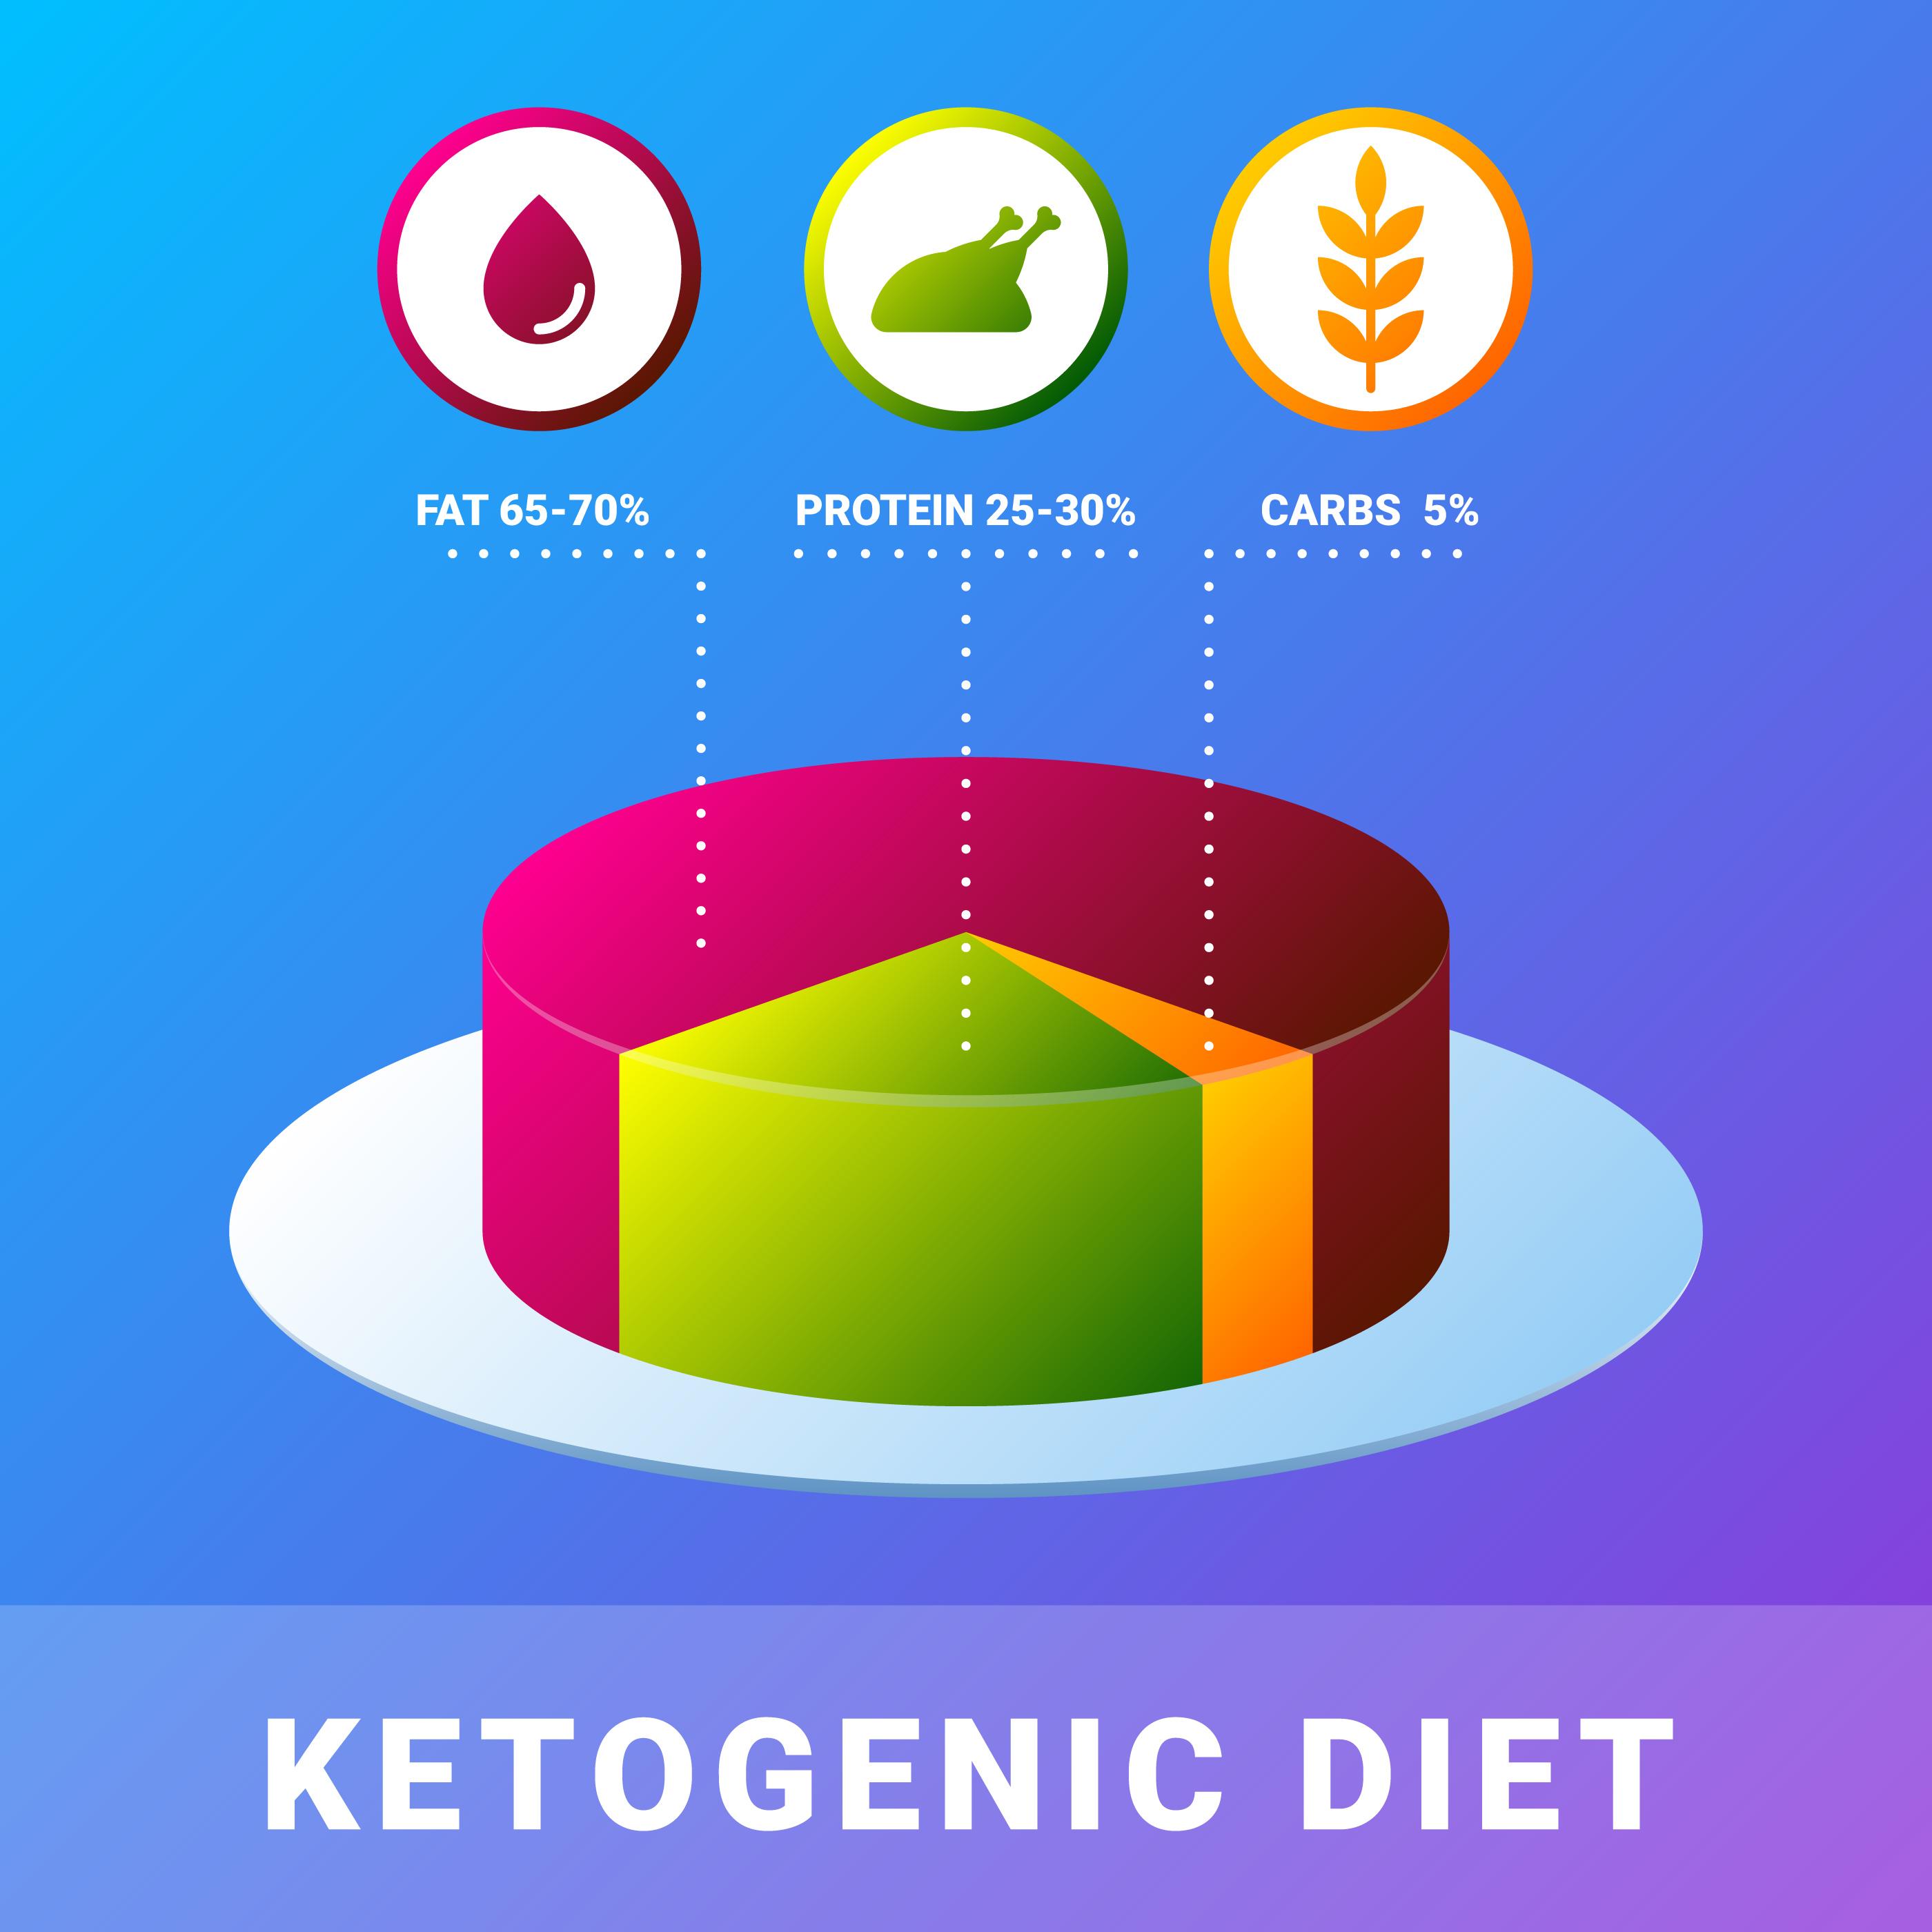 Keto Diet Infographic Flat Illustration